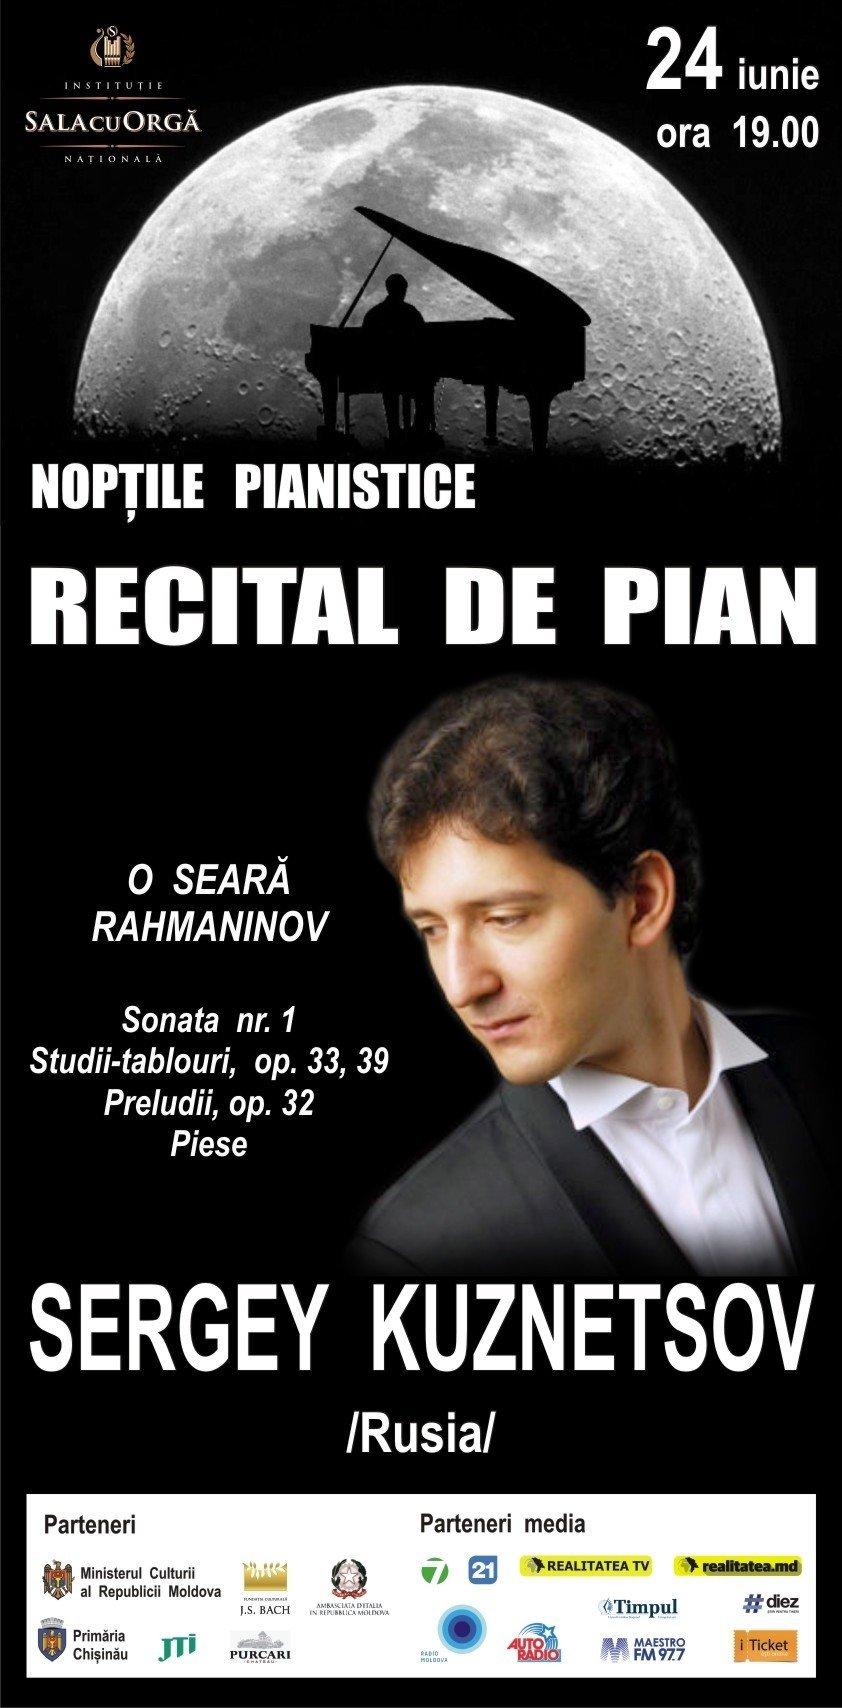 Noptile pianistice cu SERGEY KUZNETSOV